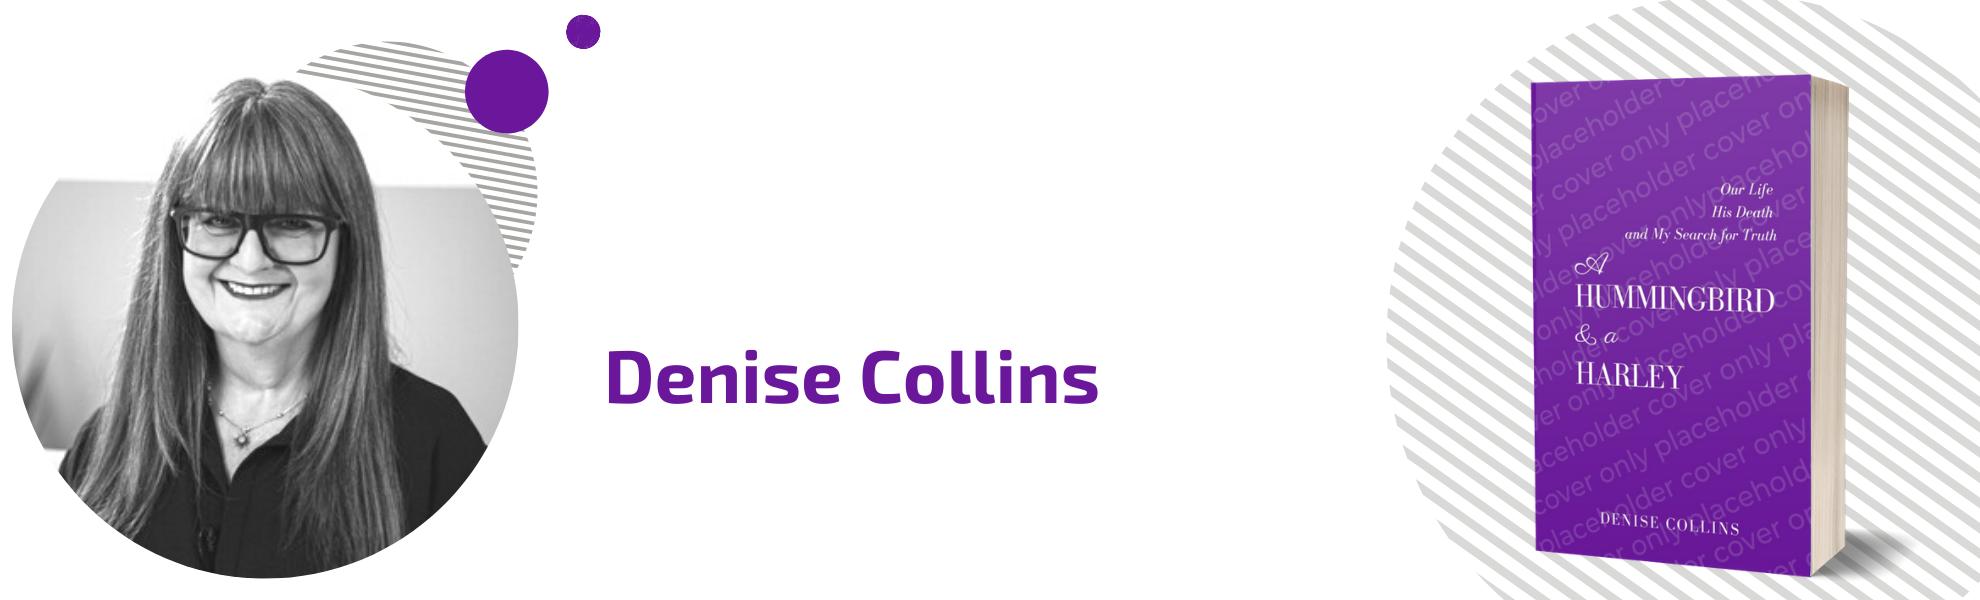 Denise Collins Header